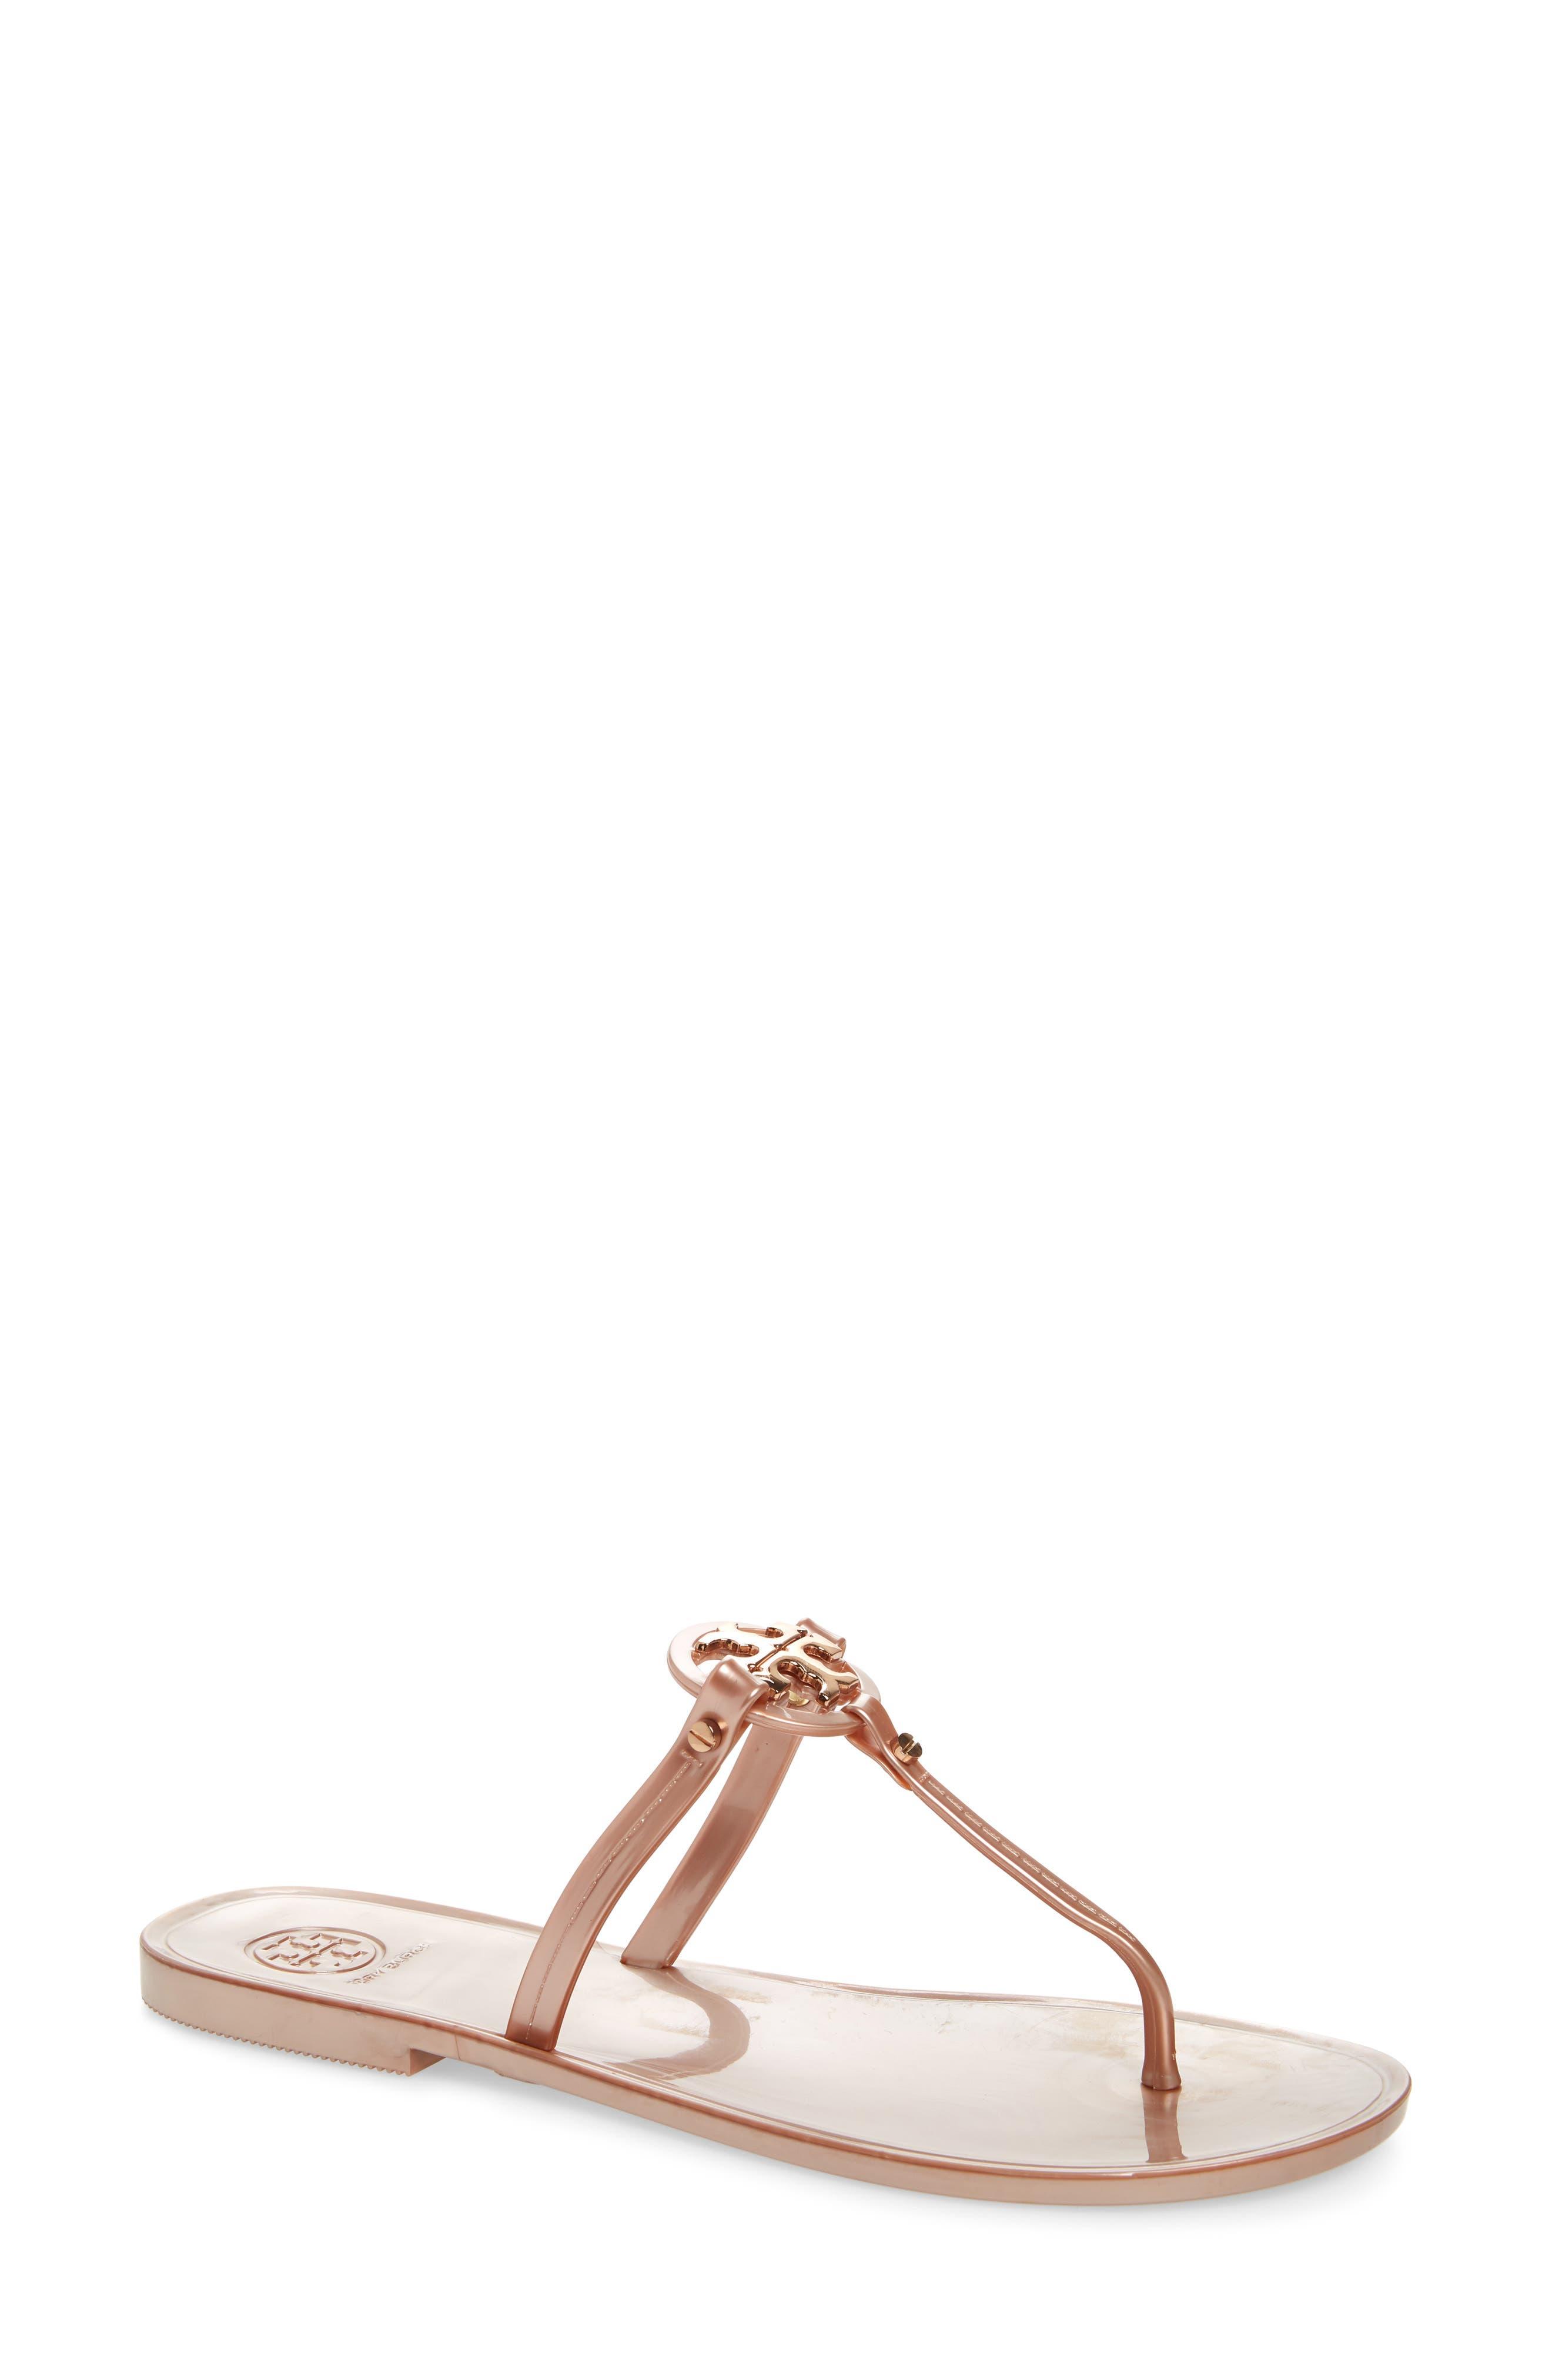 1290d87da164d Tory Burch  Mini Miller  Flat Sandal